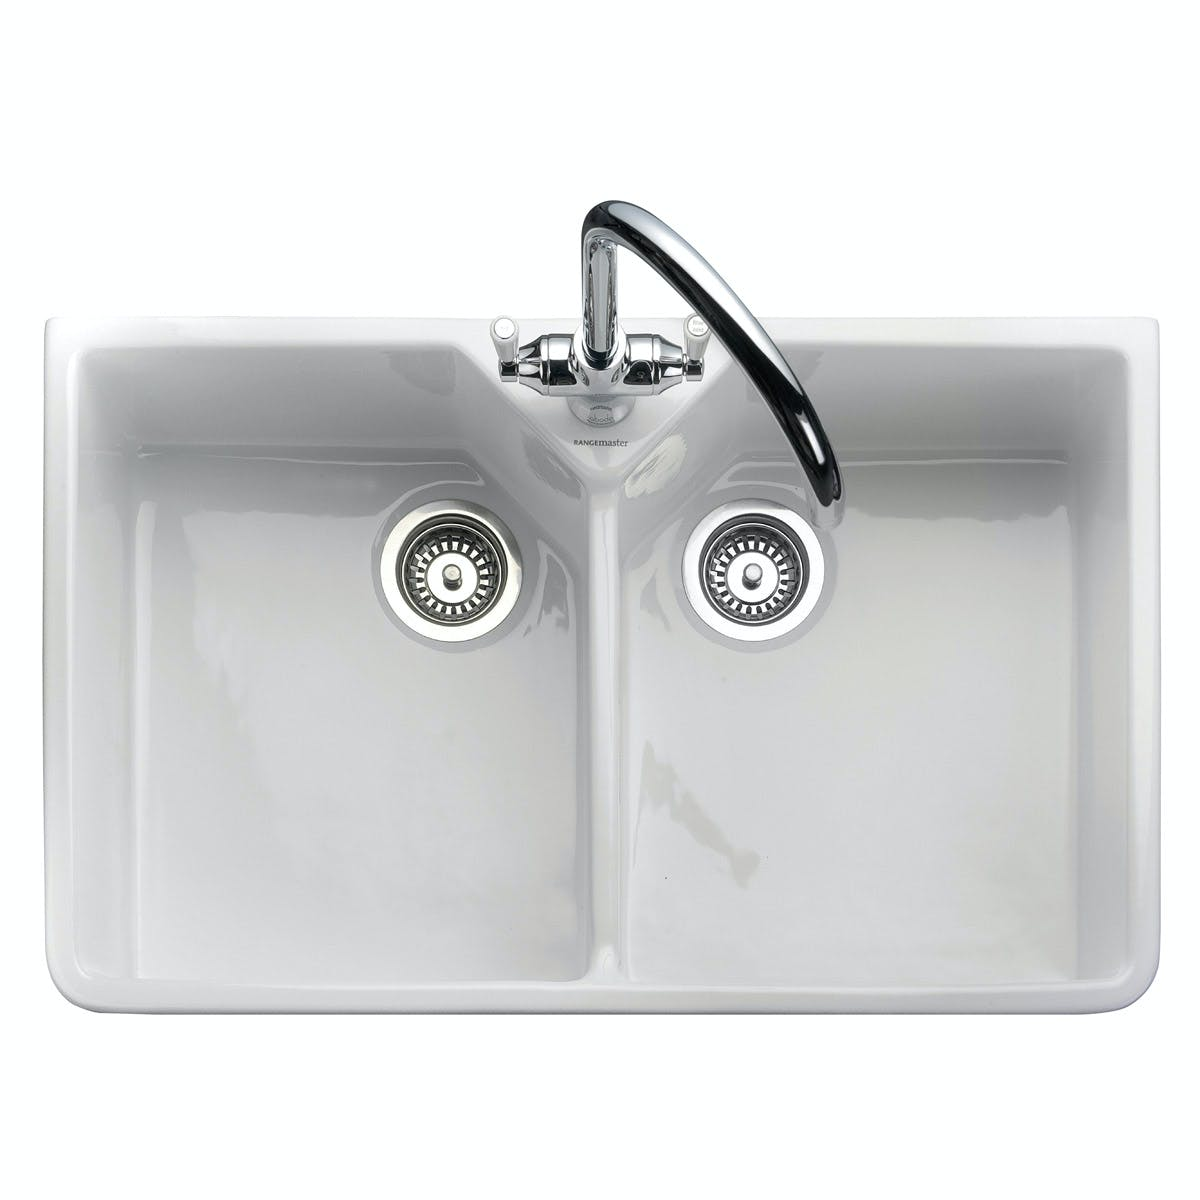 Picture of: Rangemaster Double Bowl Belfast 2 Bowl Ceramic Kitchen Sink